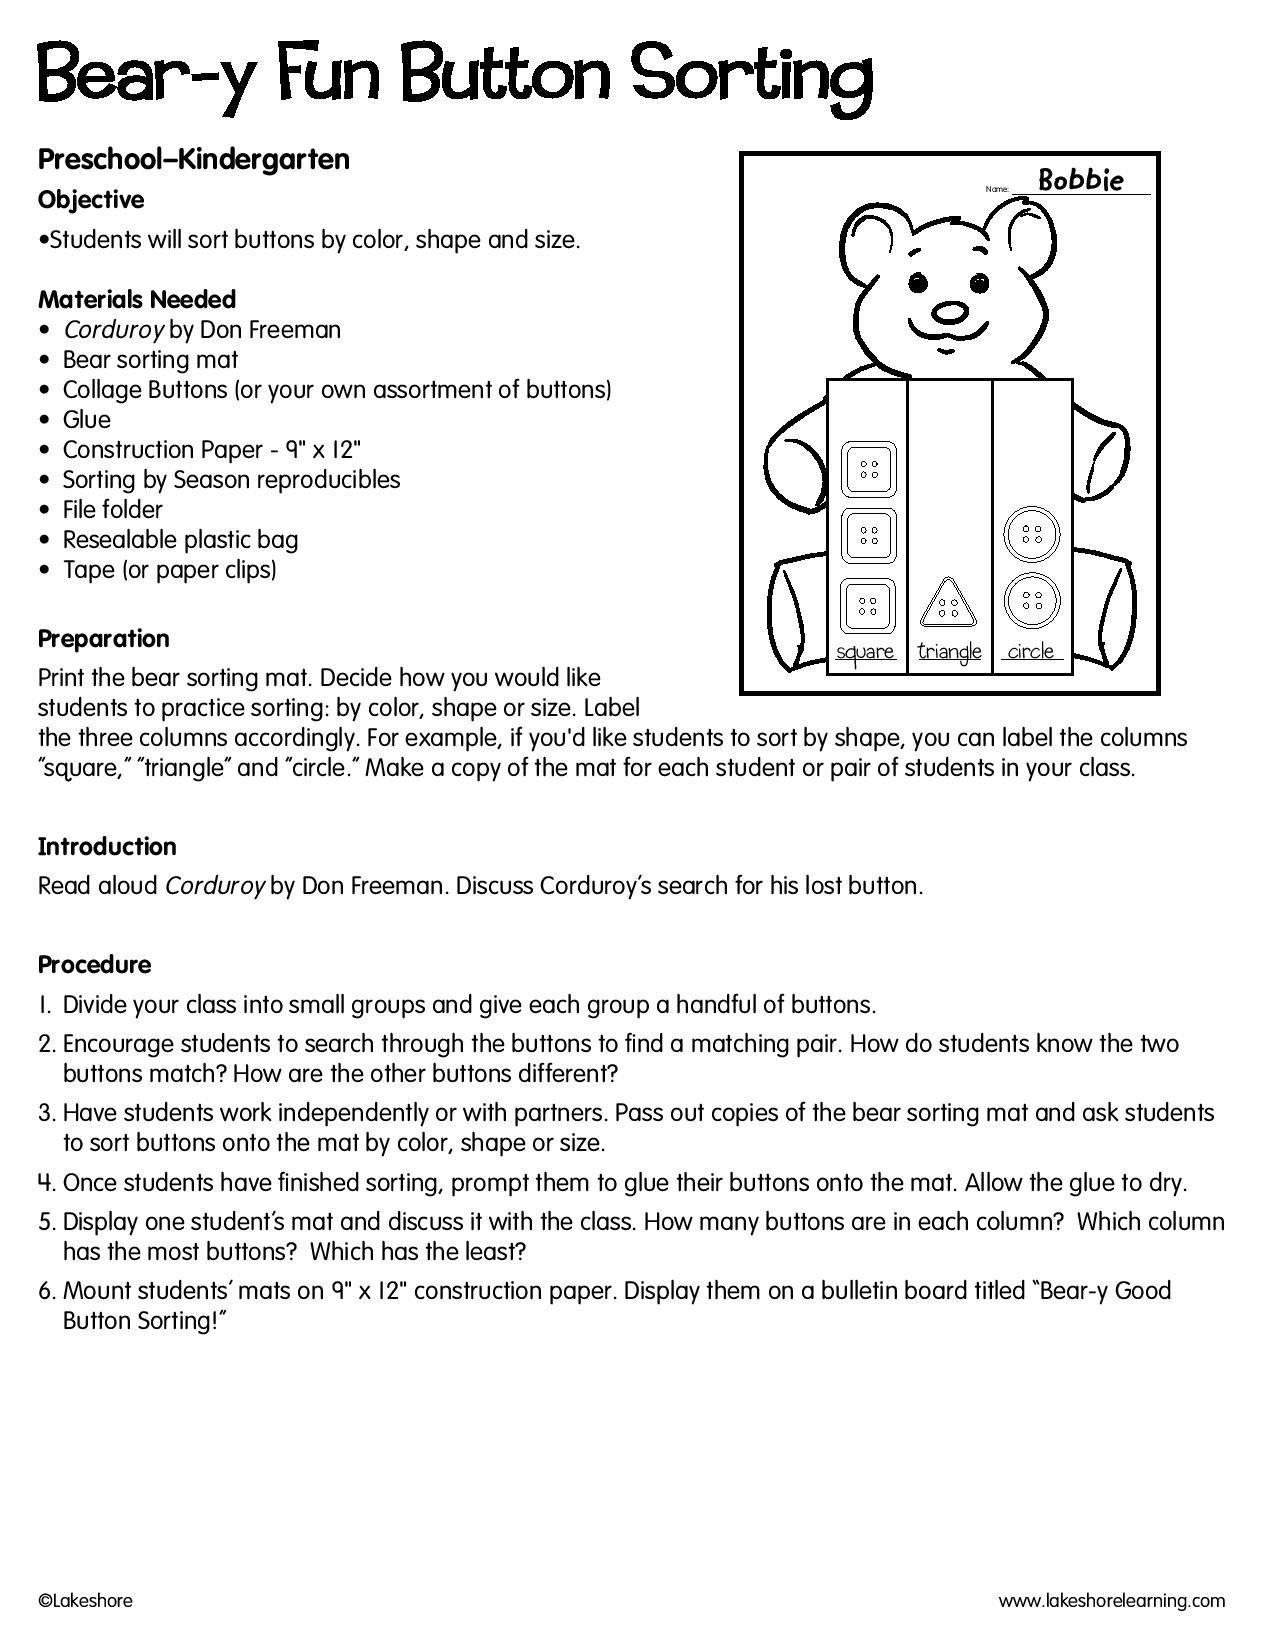 Bear Y Fun Button Sorting Lessonplan